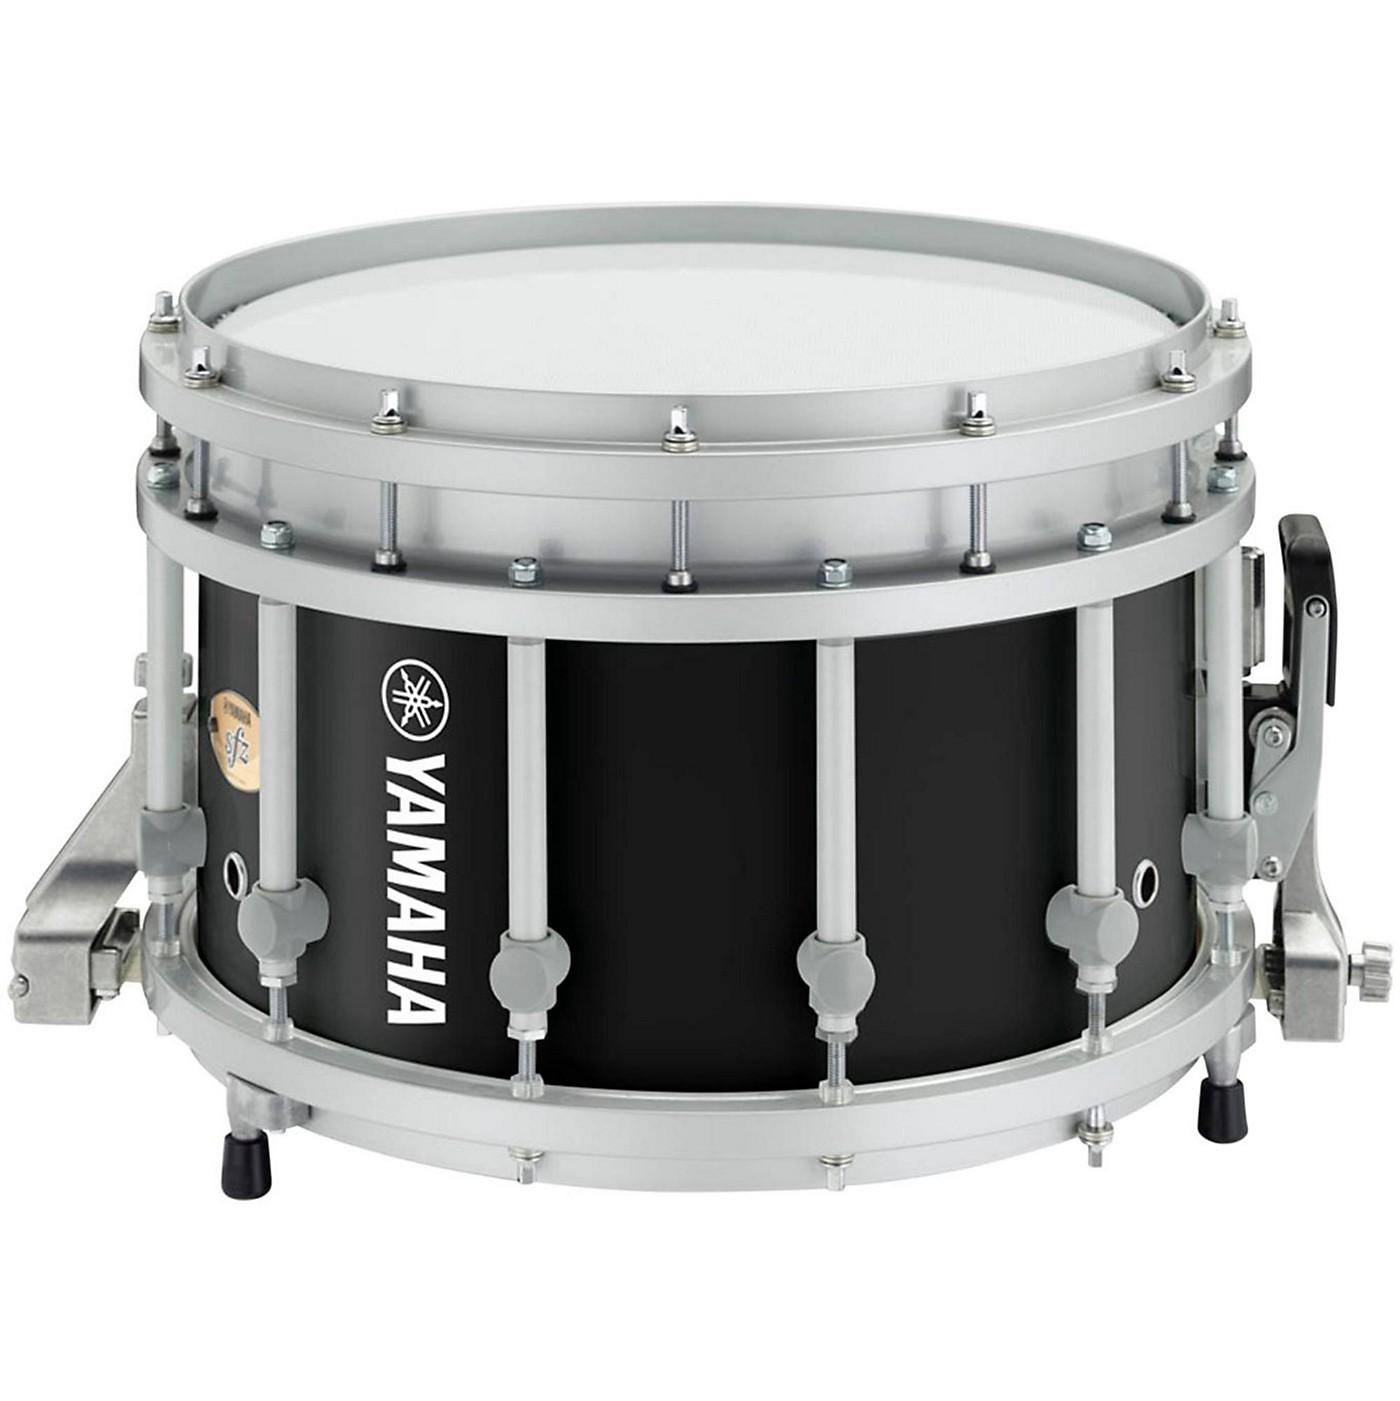 Yamaha 9300 Series Piccolo SFZ Marching Snare Drum thumbnail